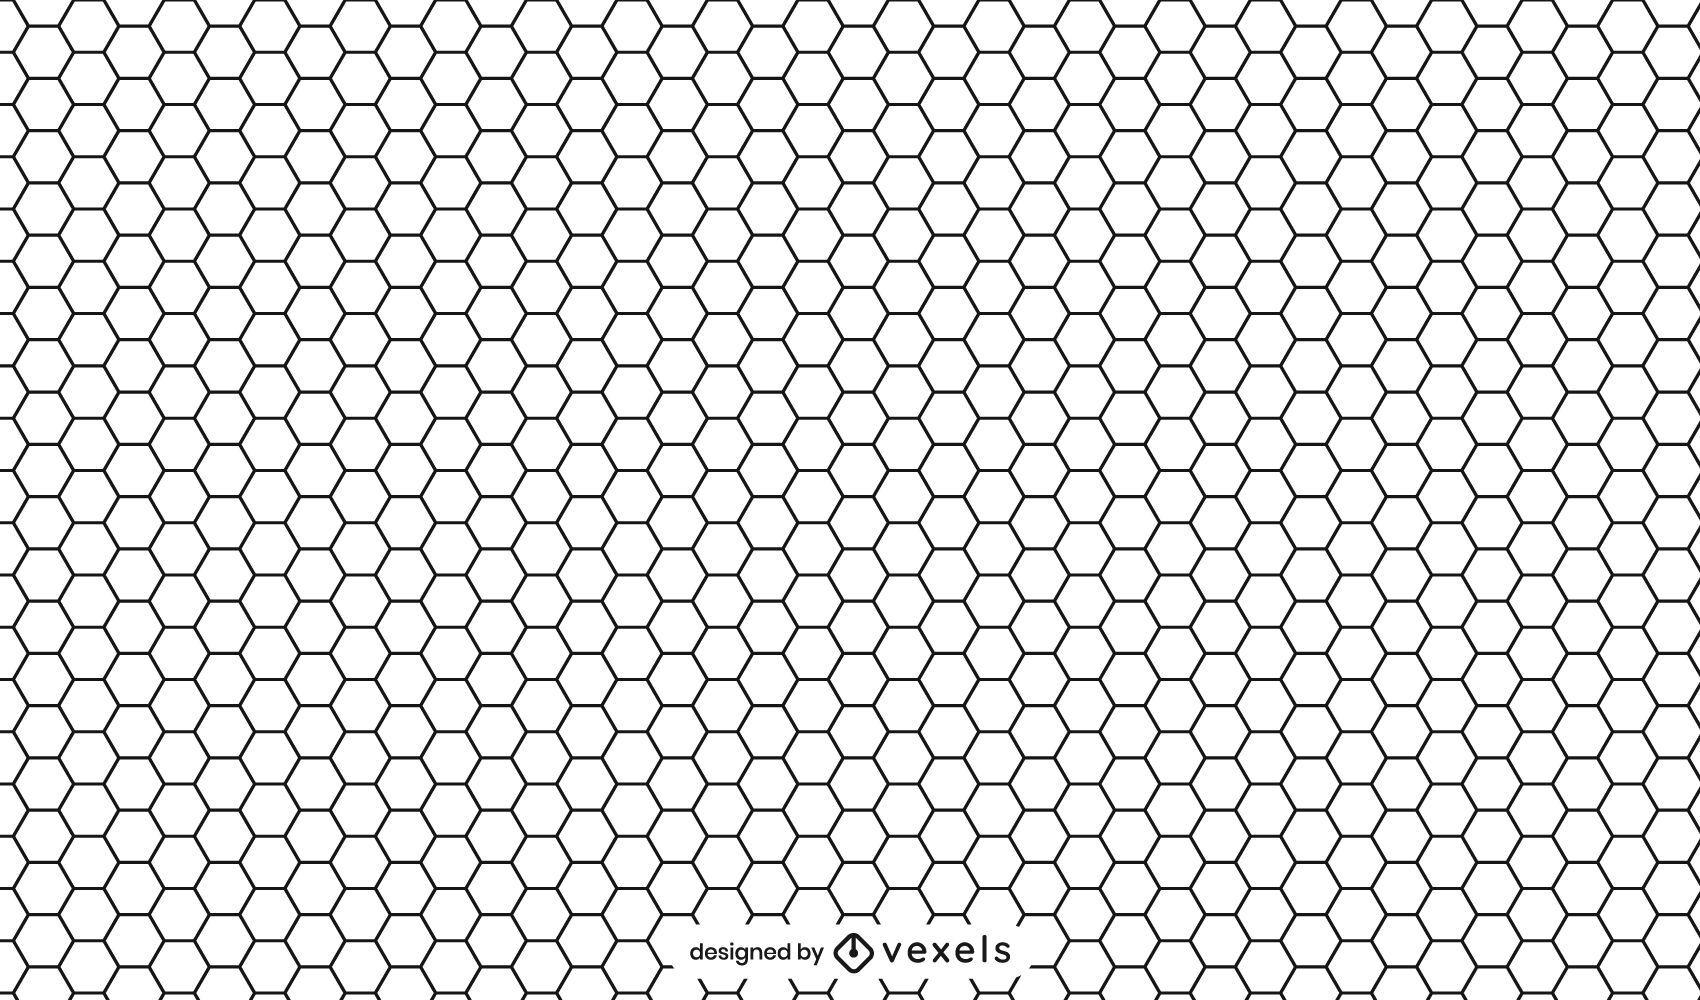 Honeycomb black and white pattern